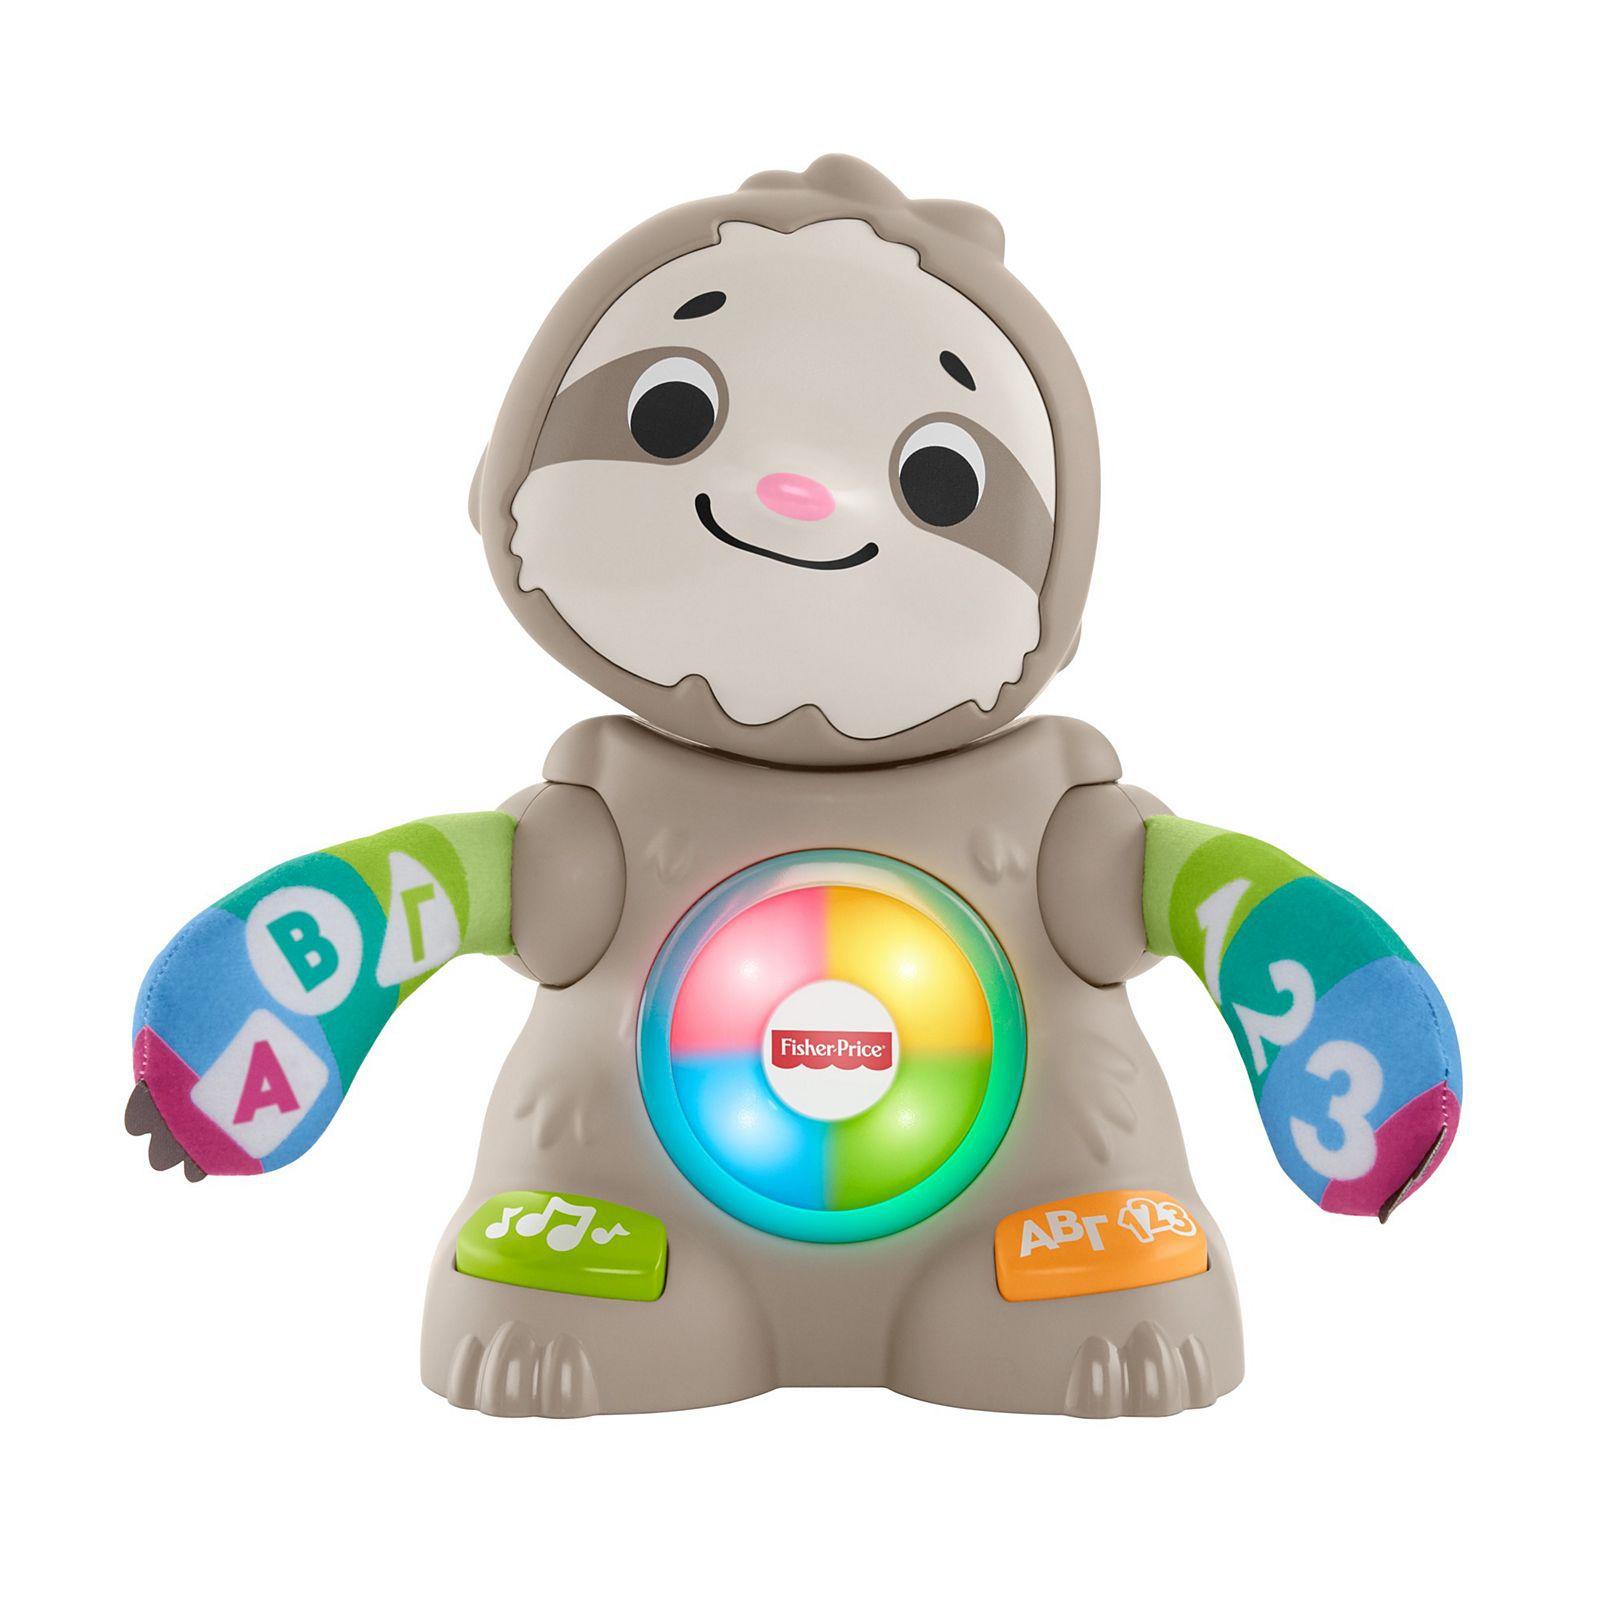 Fisher Price Linkimals Bicho Preguica GHY98 Mattel